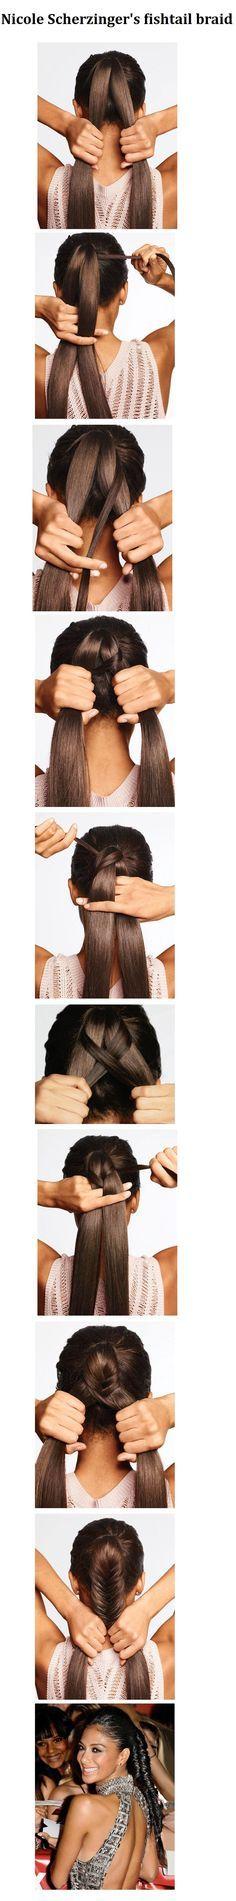 Nicole Scherzinger's fishtail braid